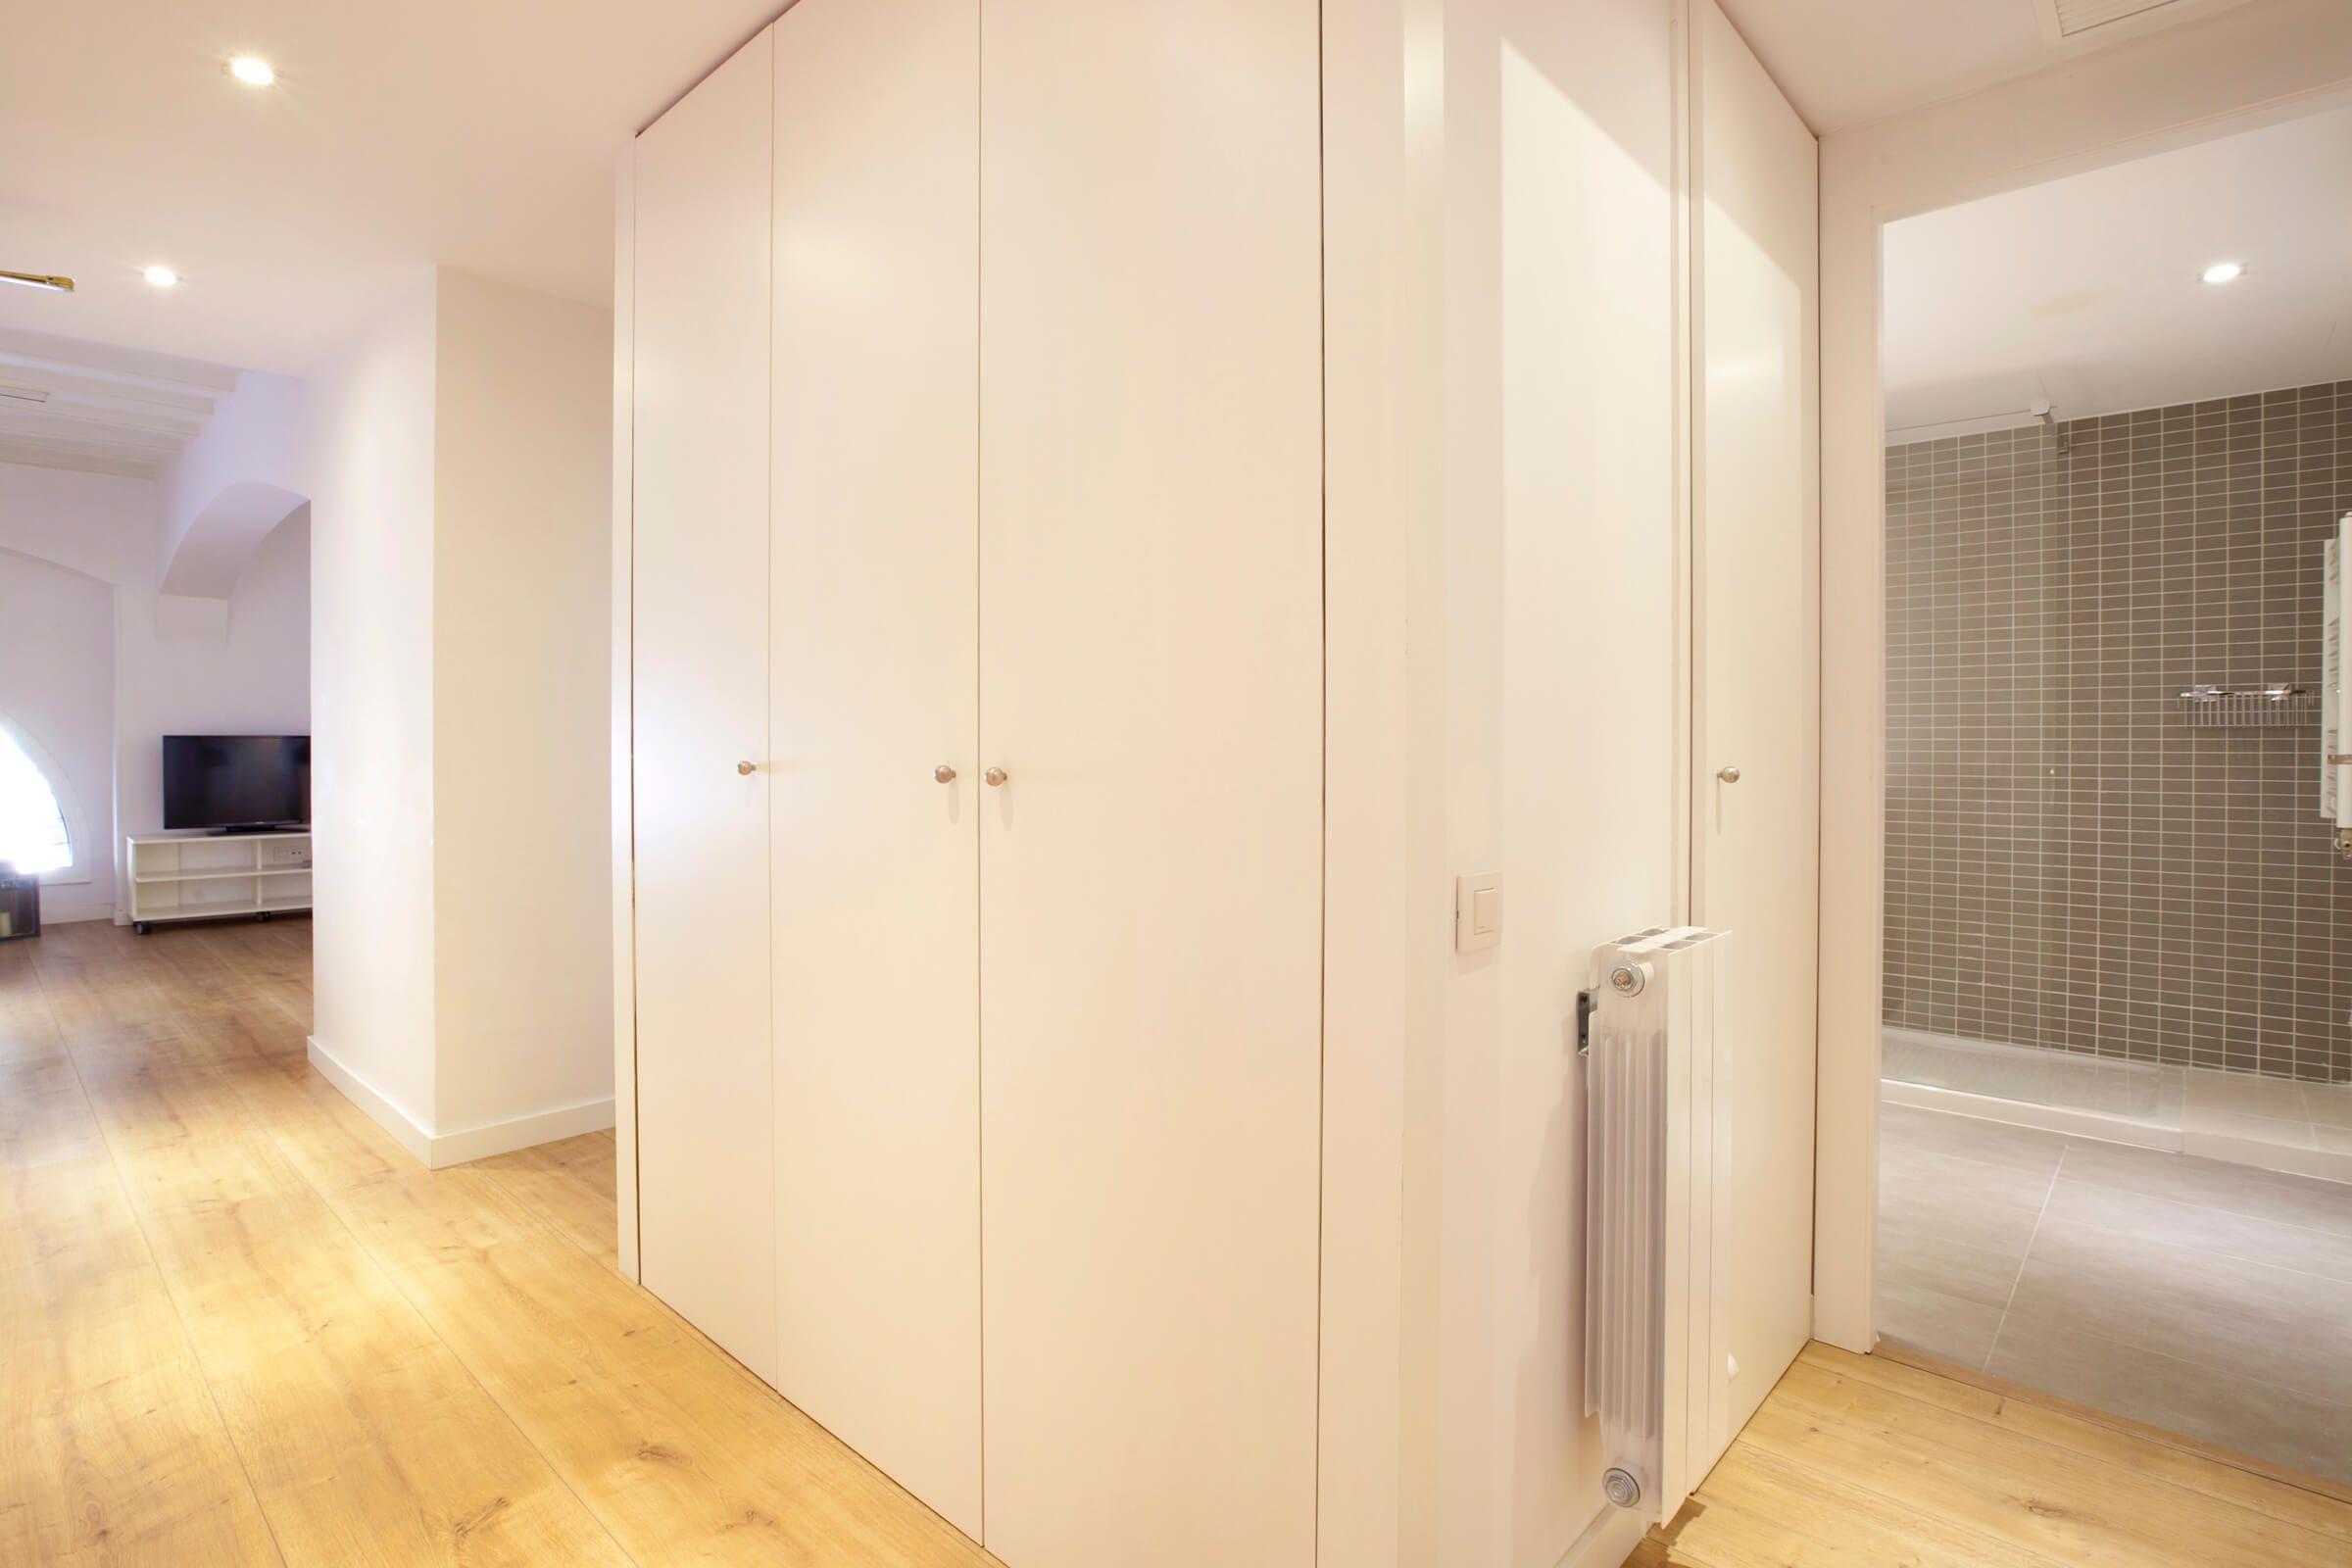 Luxury flat in Barcelona on the mezzanine floor